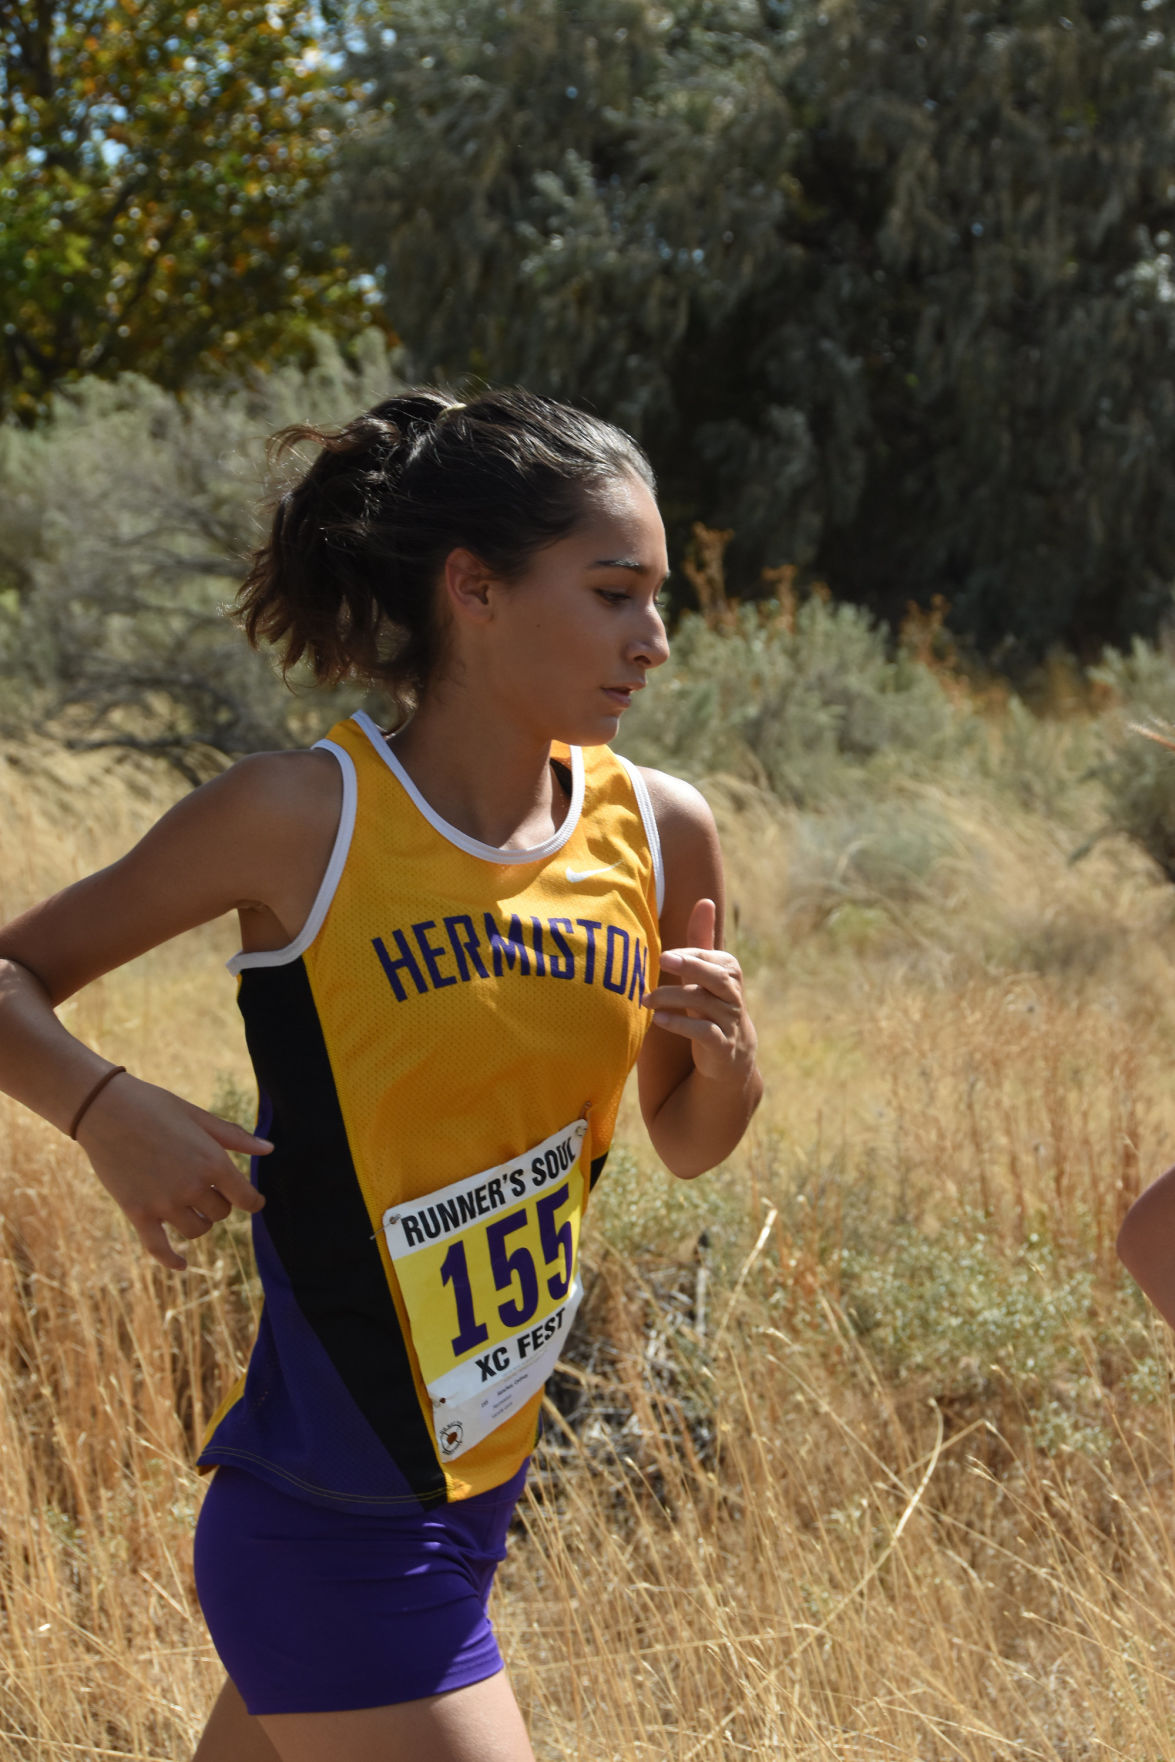 Hermiston finishes strong at Oregon City